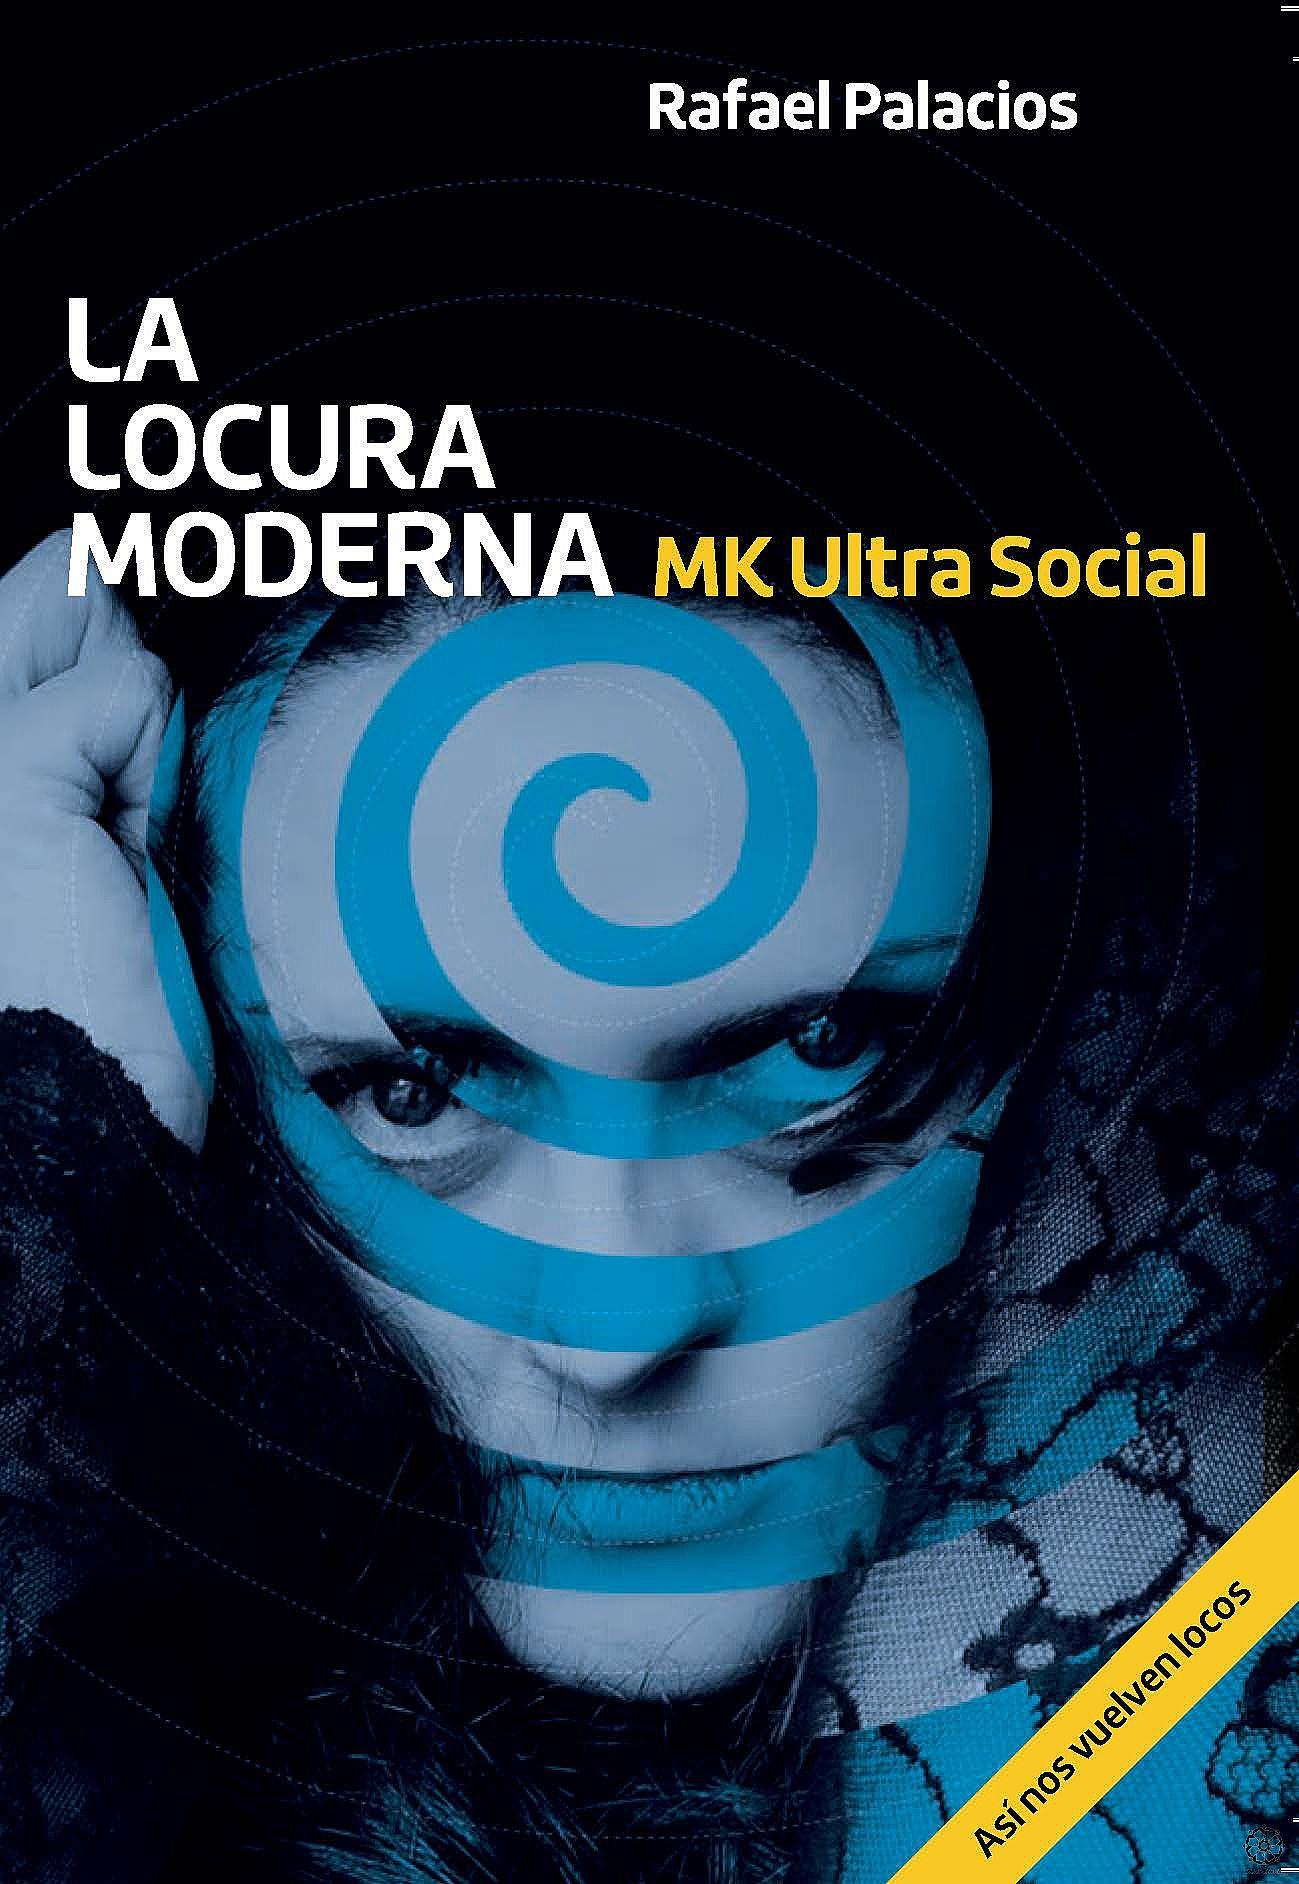 La locura moderna MK Ultra Social